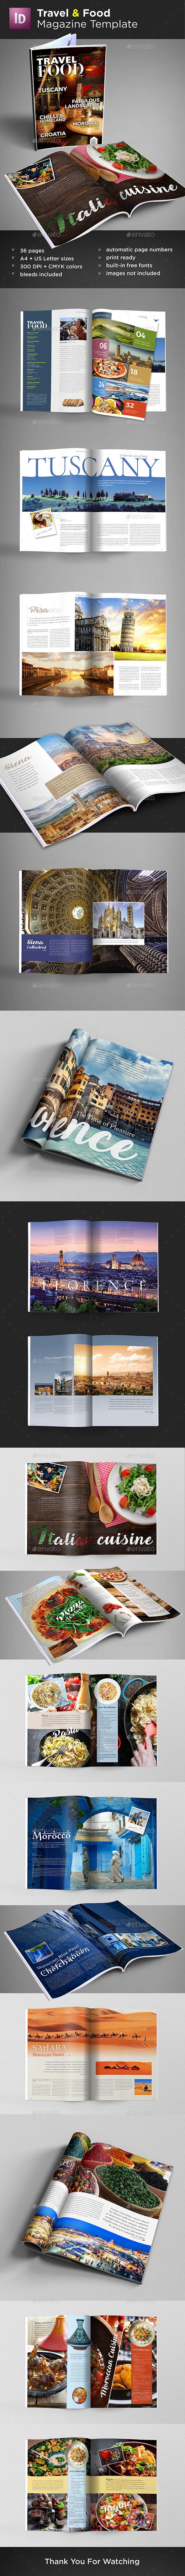 GraphicRiver Travel & Food Magazine Template 20703663